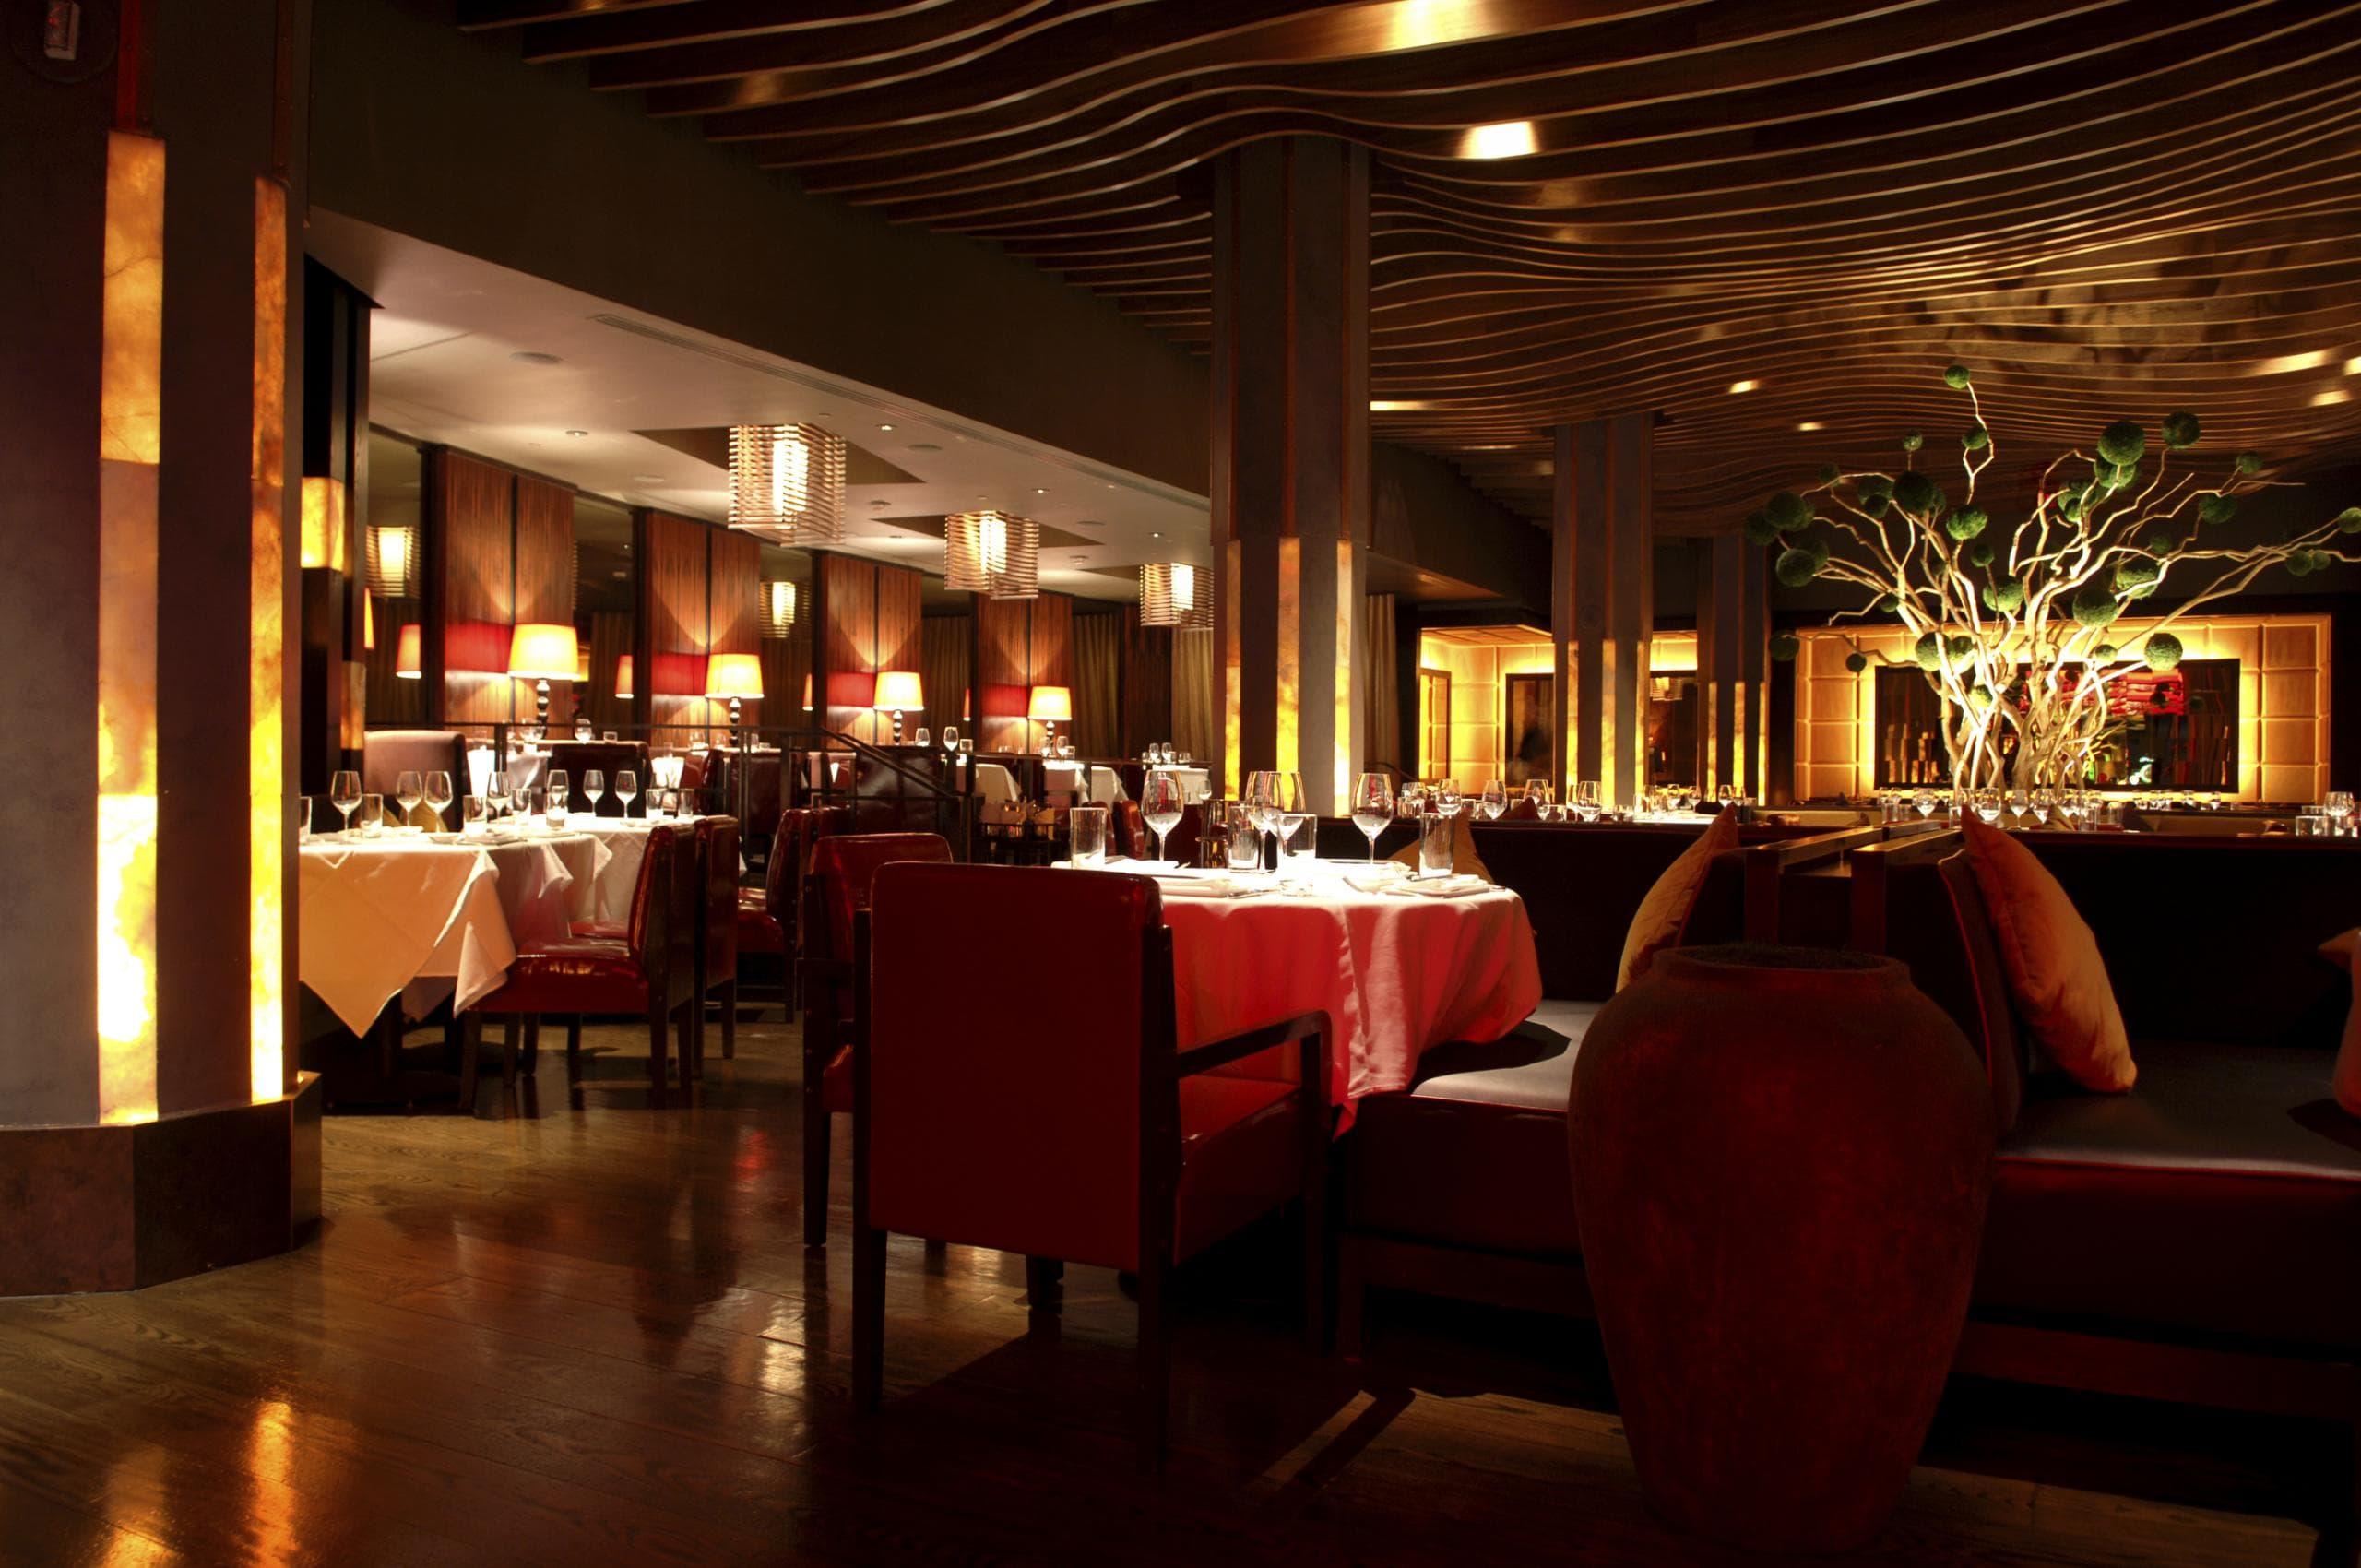 Restaurant, Hospitality & Beverage Law